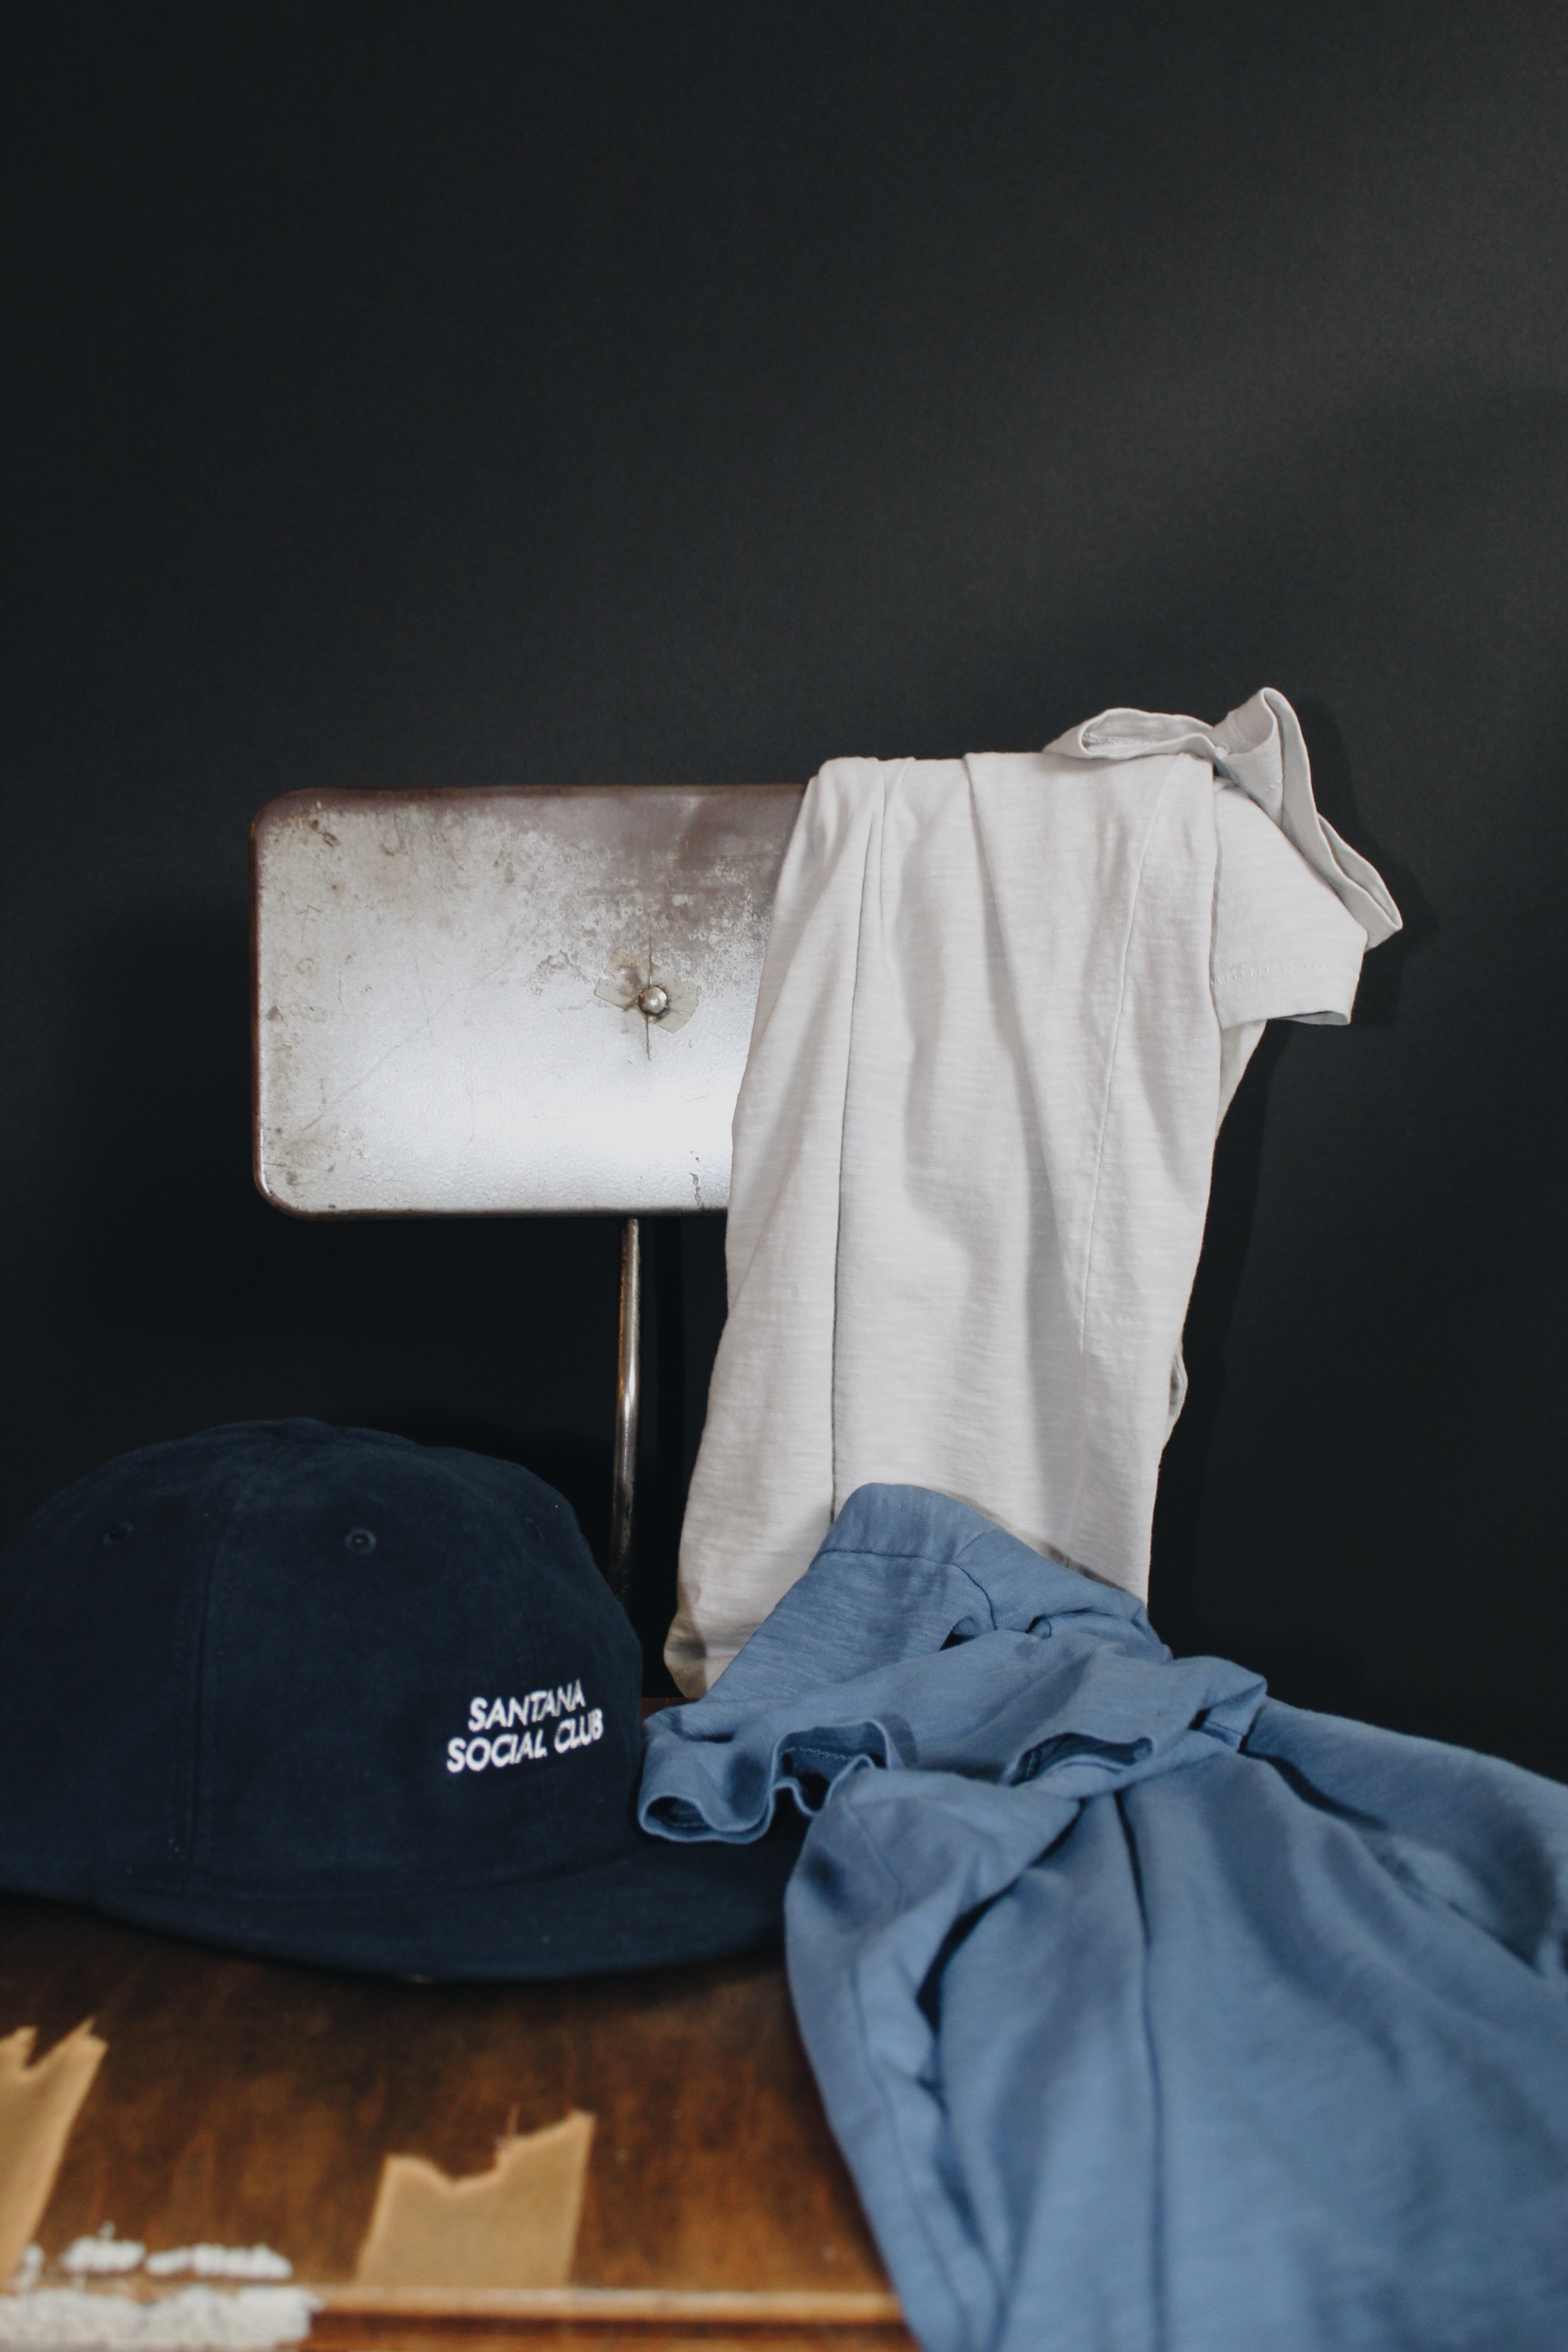 stark-tee-vintage-dyed-santana-social-club-made-in-usa.JPG